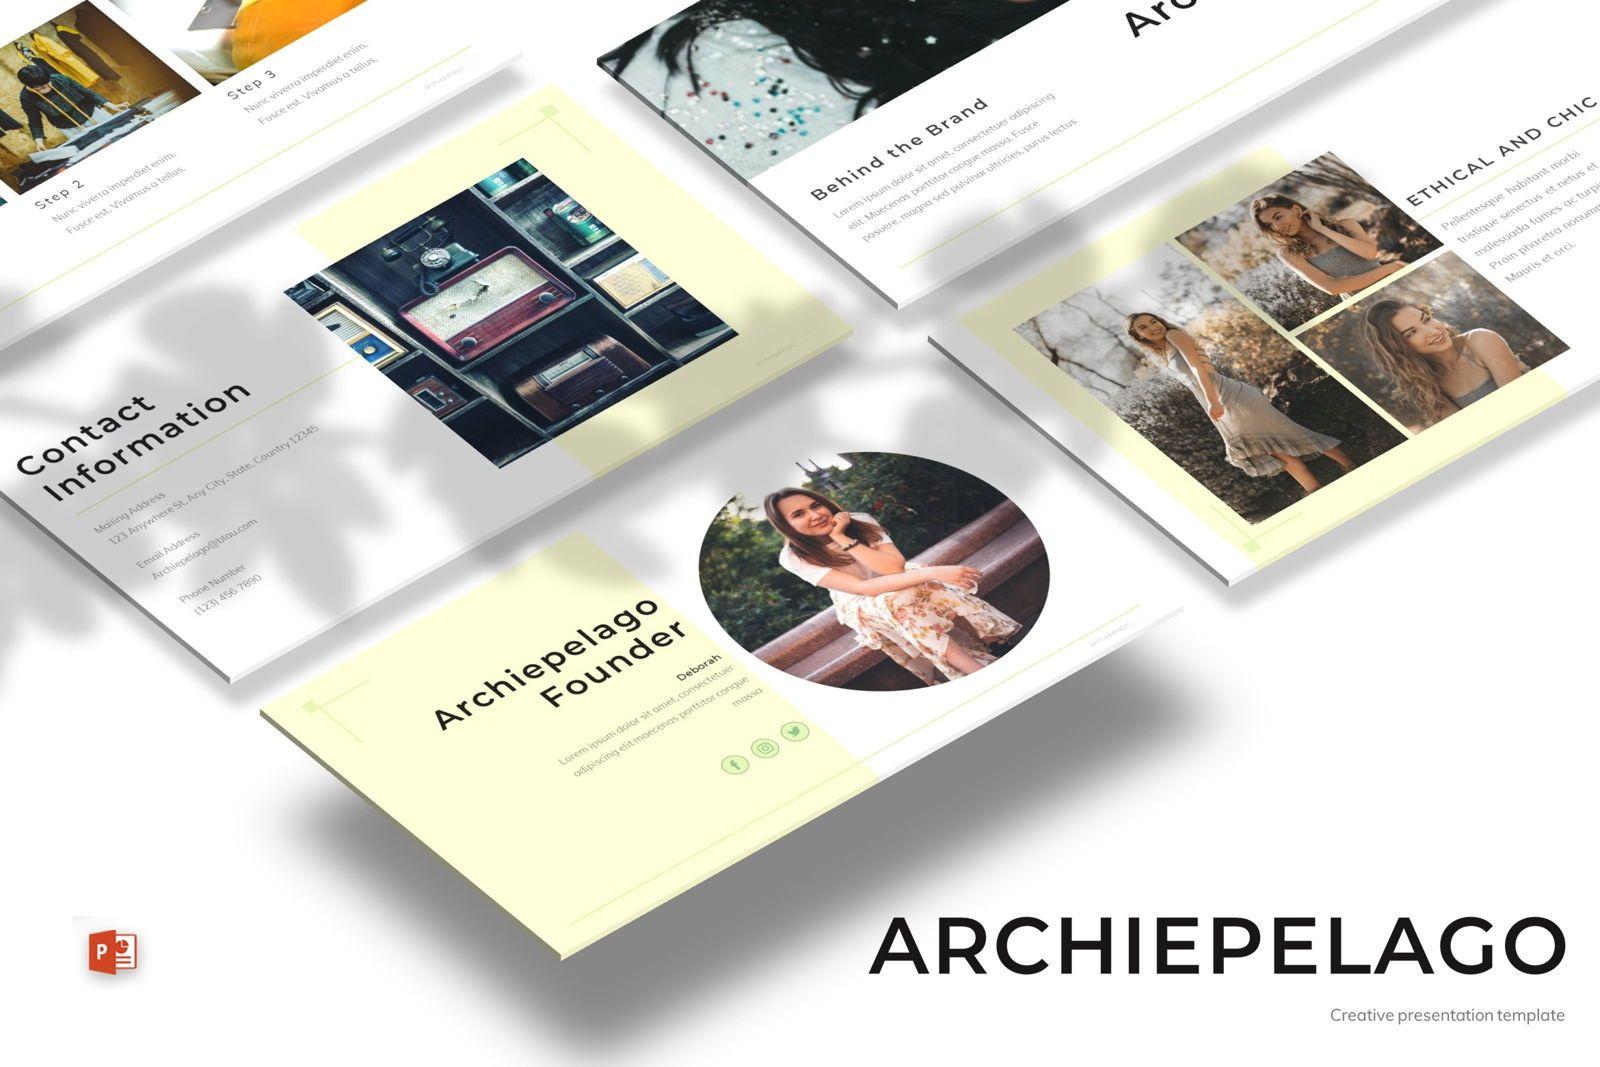 Archiepelago - Powerpoint Template, 07697, Presentation Templates — PoweredTemplate.com